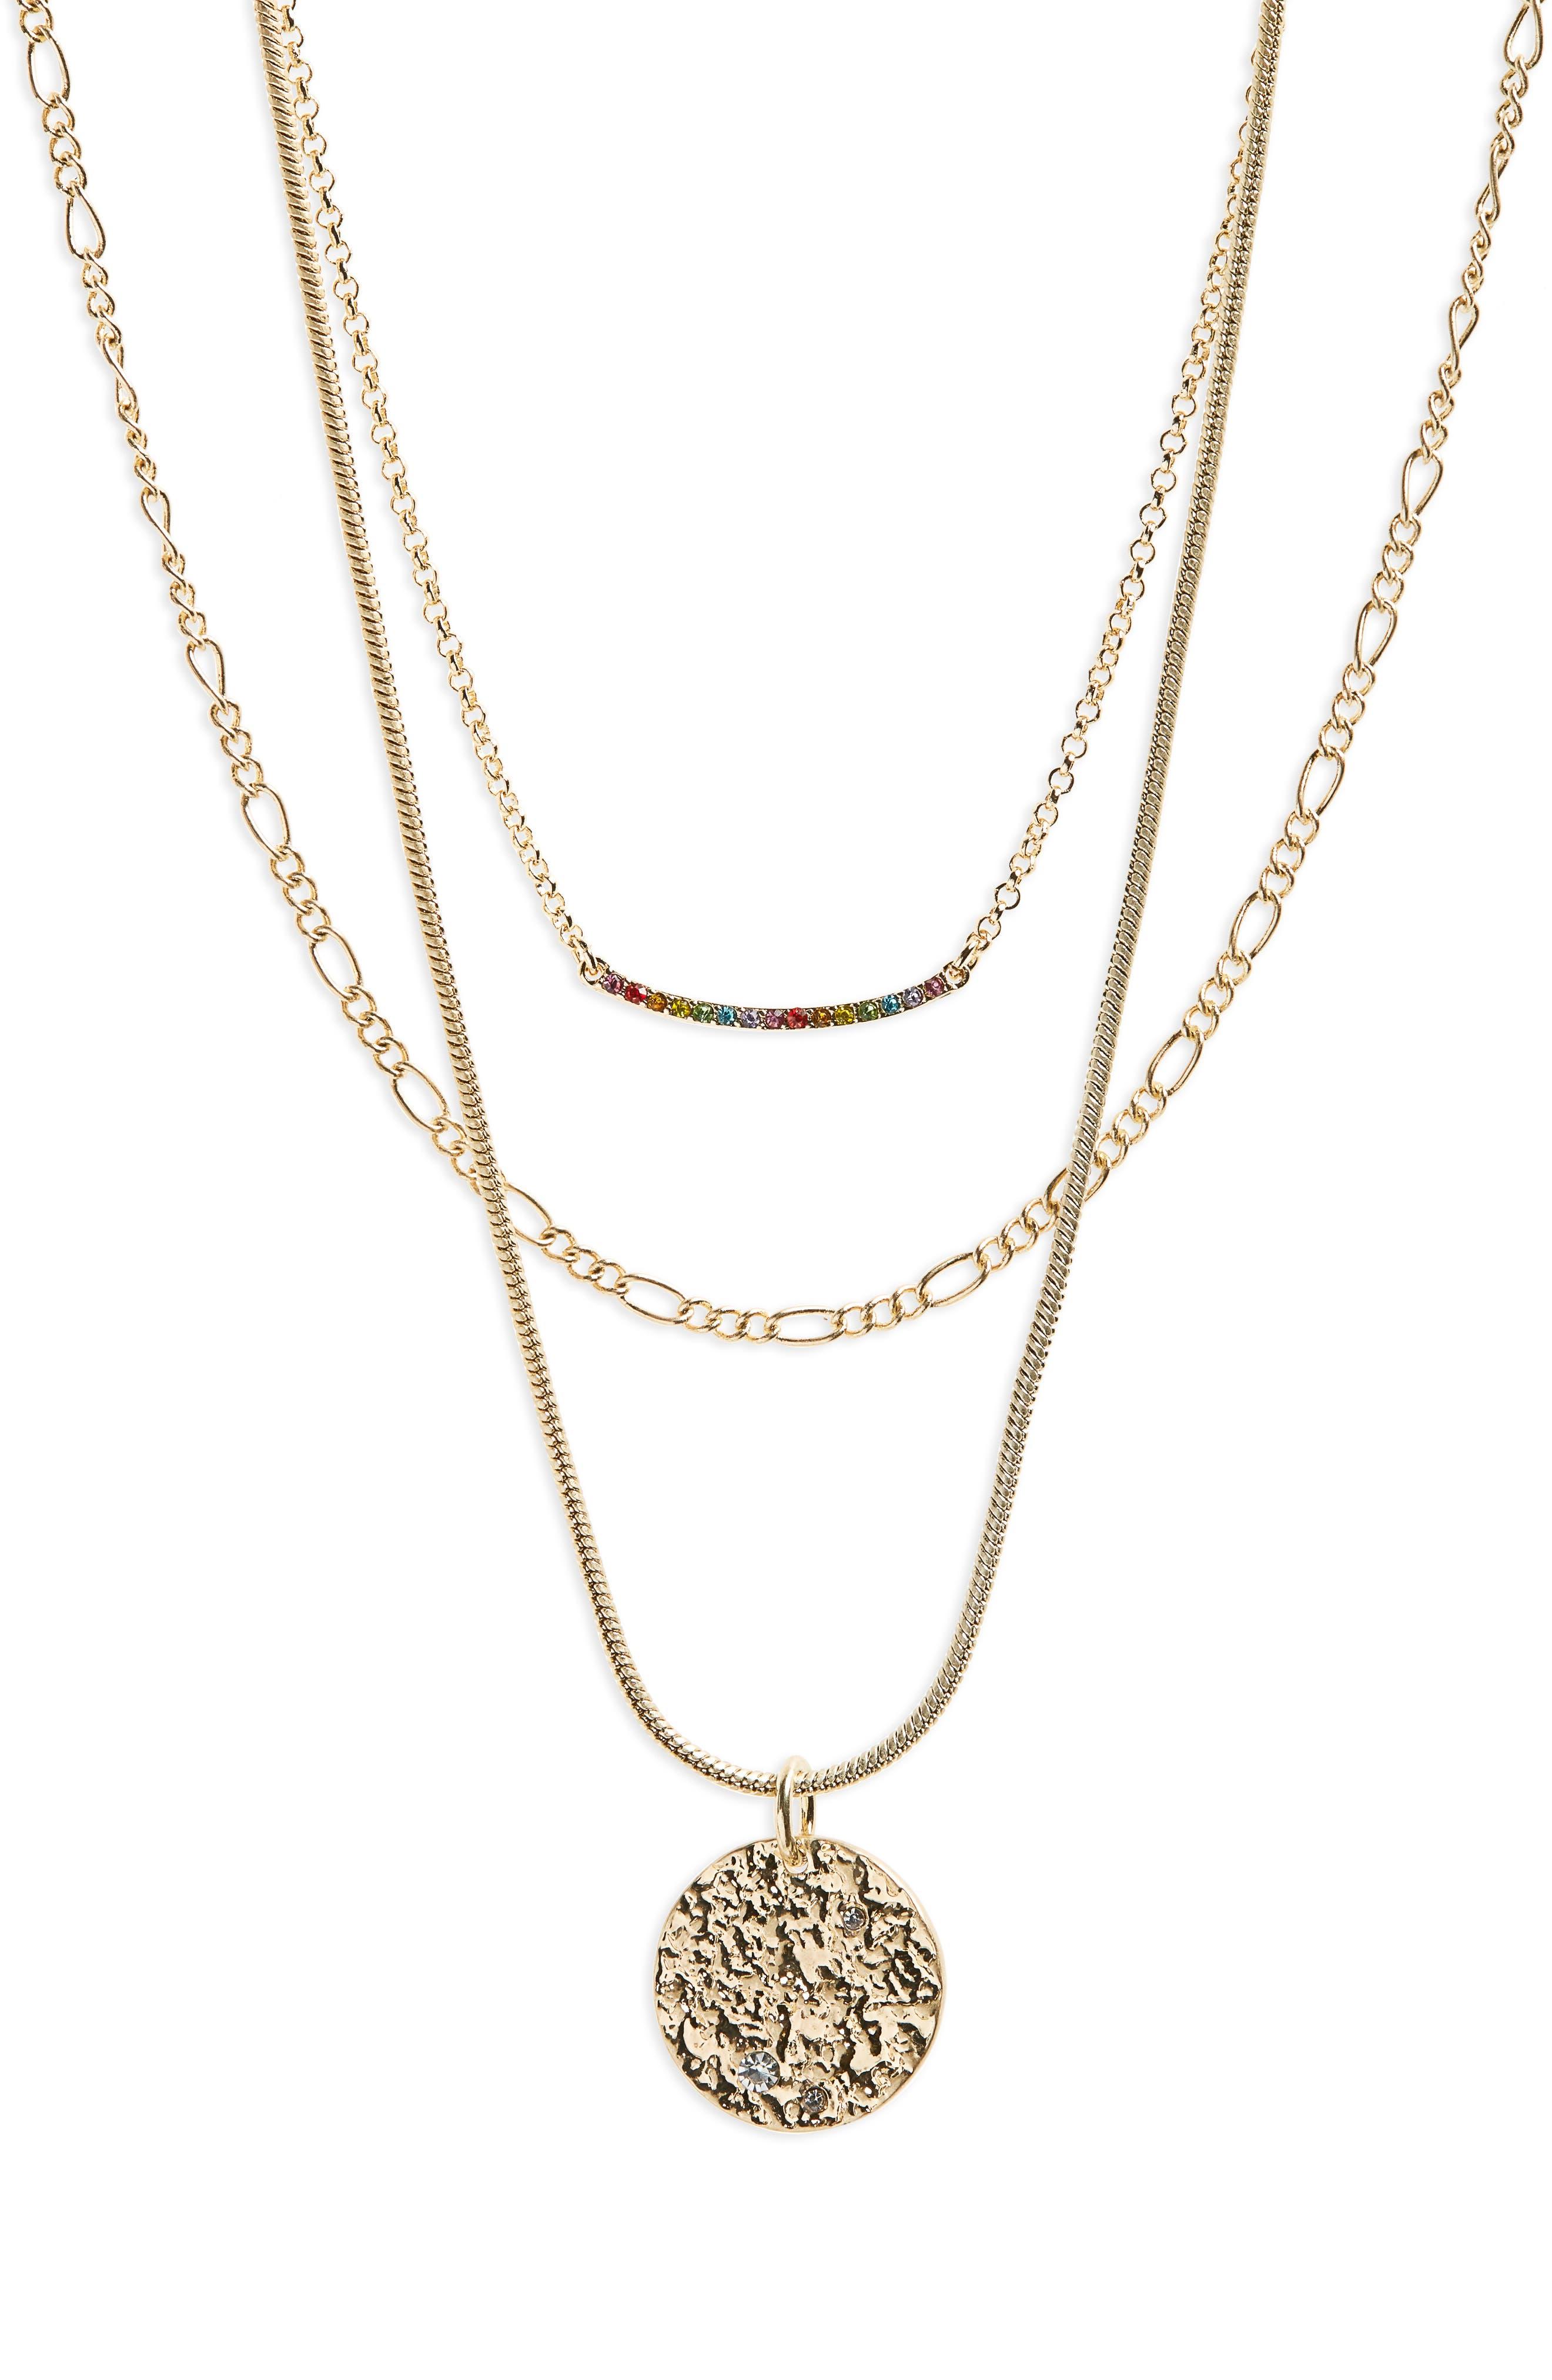 Multistrand Bar & Pendant Necklace,                             Main thumbnail 1, color,                             000